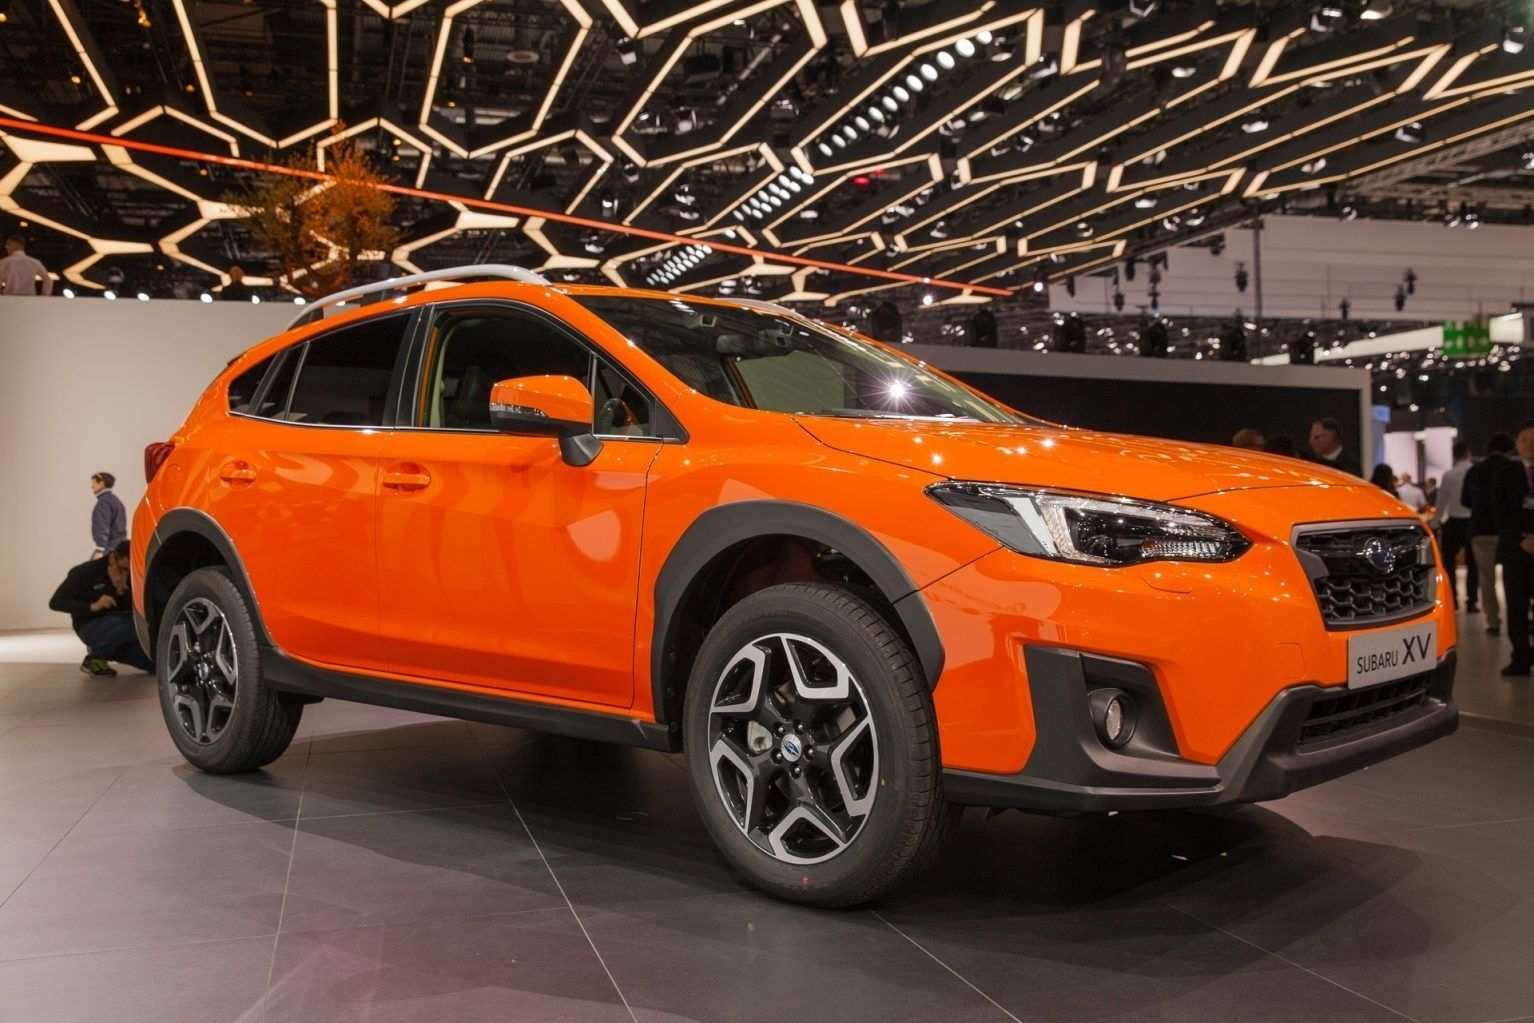 22 Concept of Subaru Electric Car 2019 Spy Shoot by Subaru Electric Car 2019